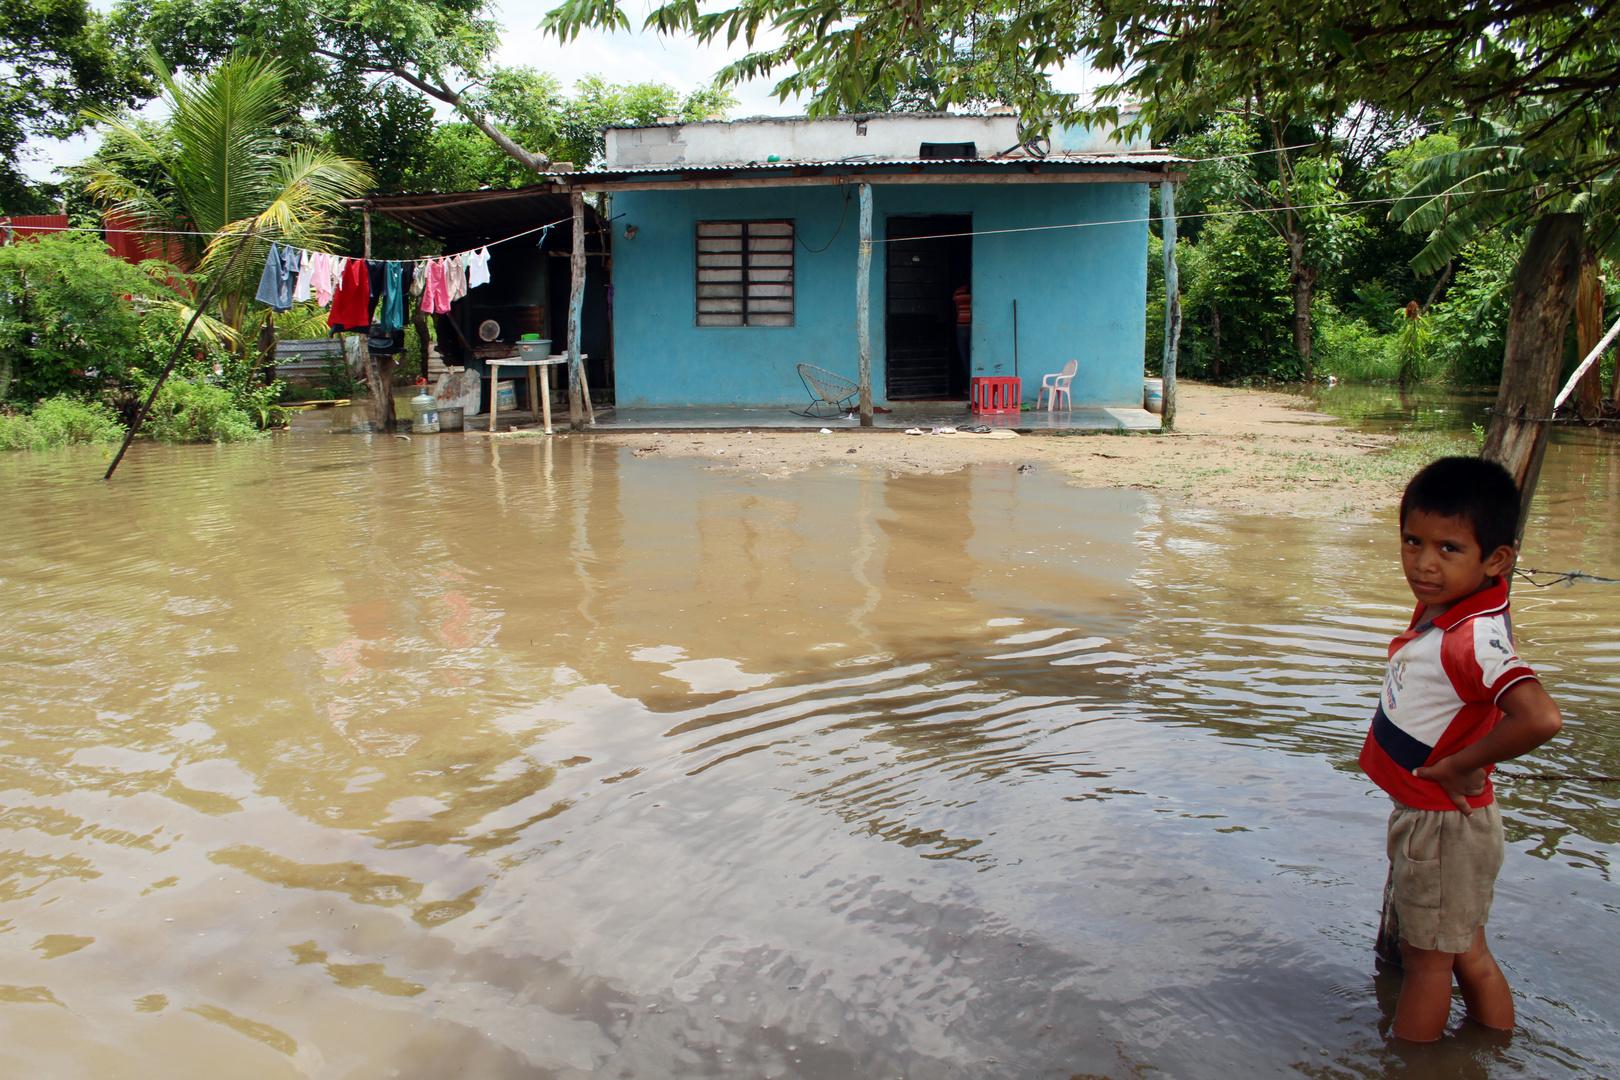 temporada de inundación